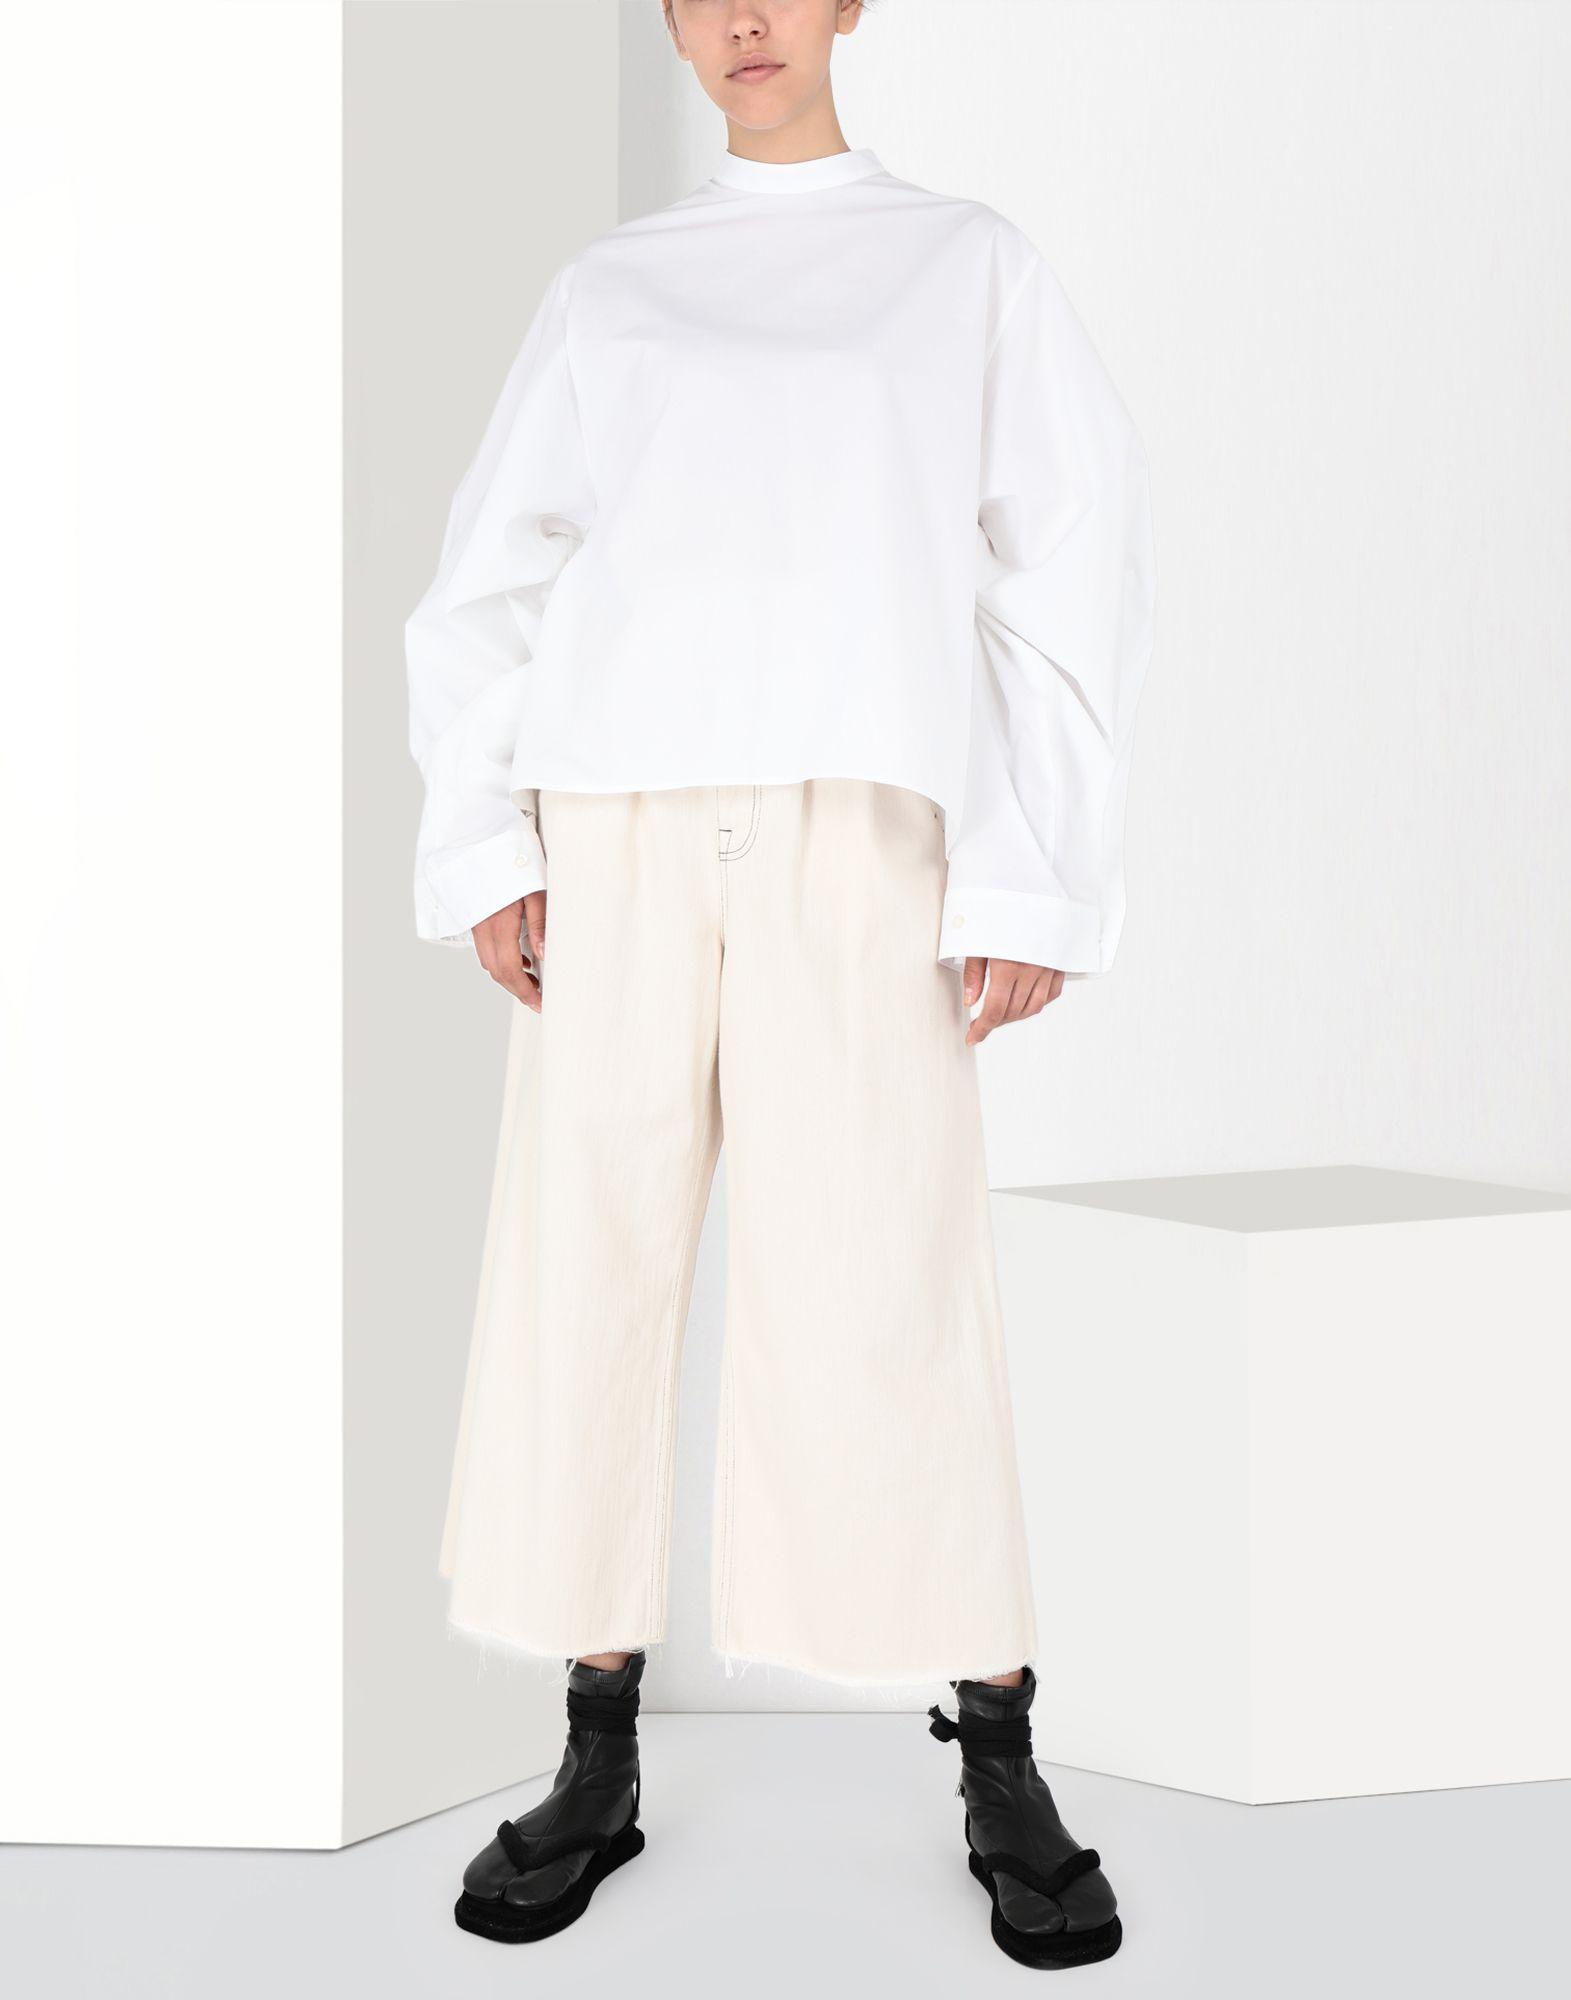 MM6 MAISON MARGIELA Flared cotton trousers Casual pants Woman r